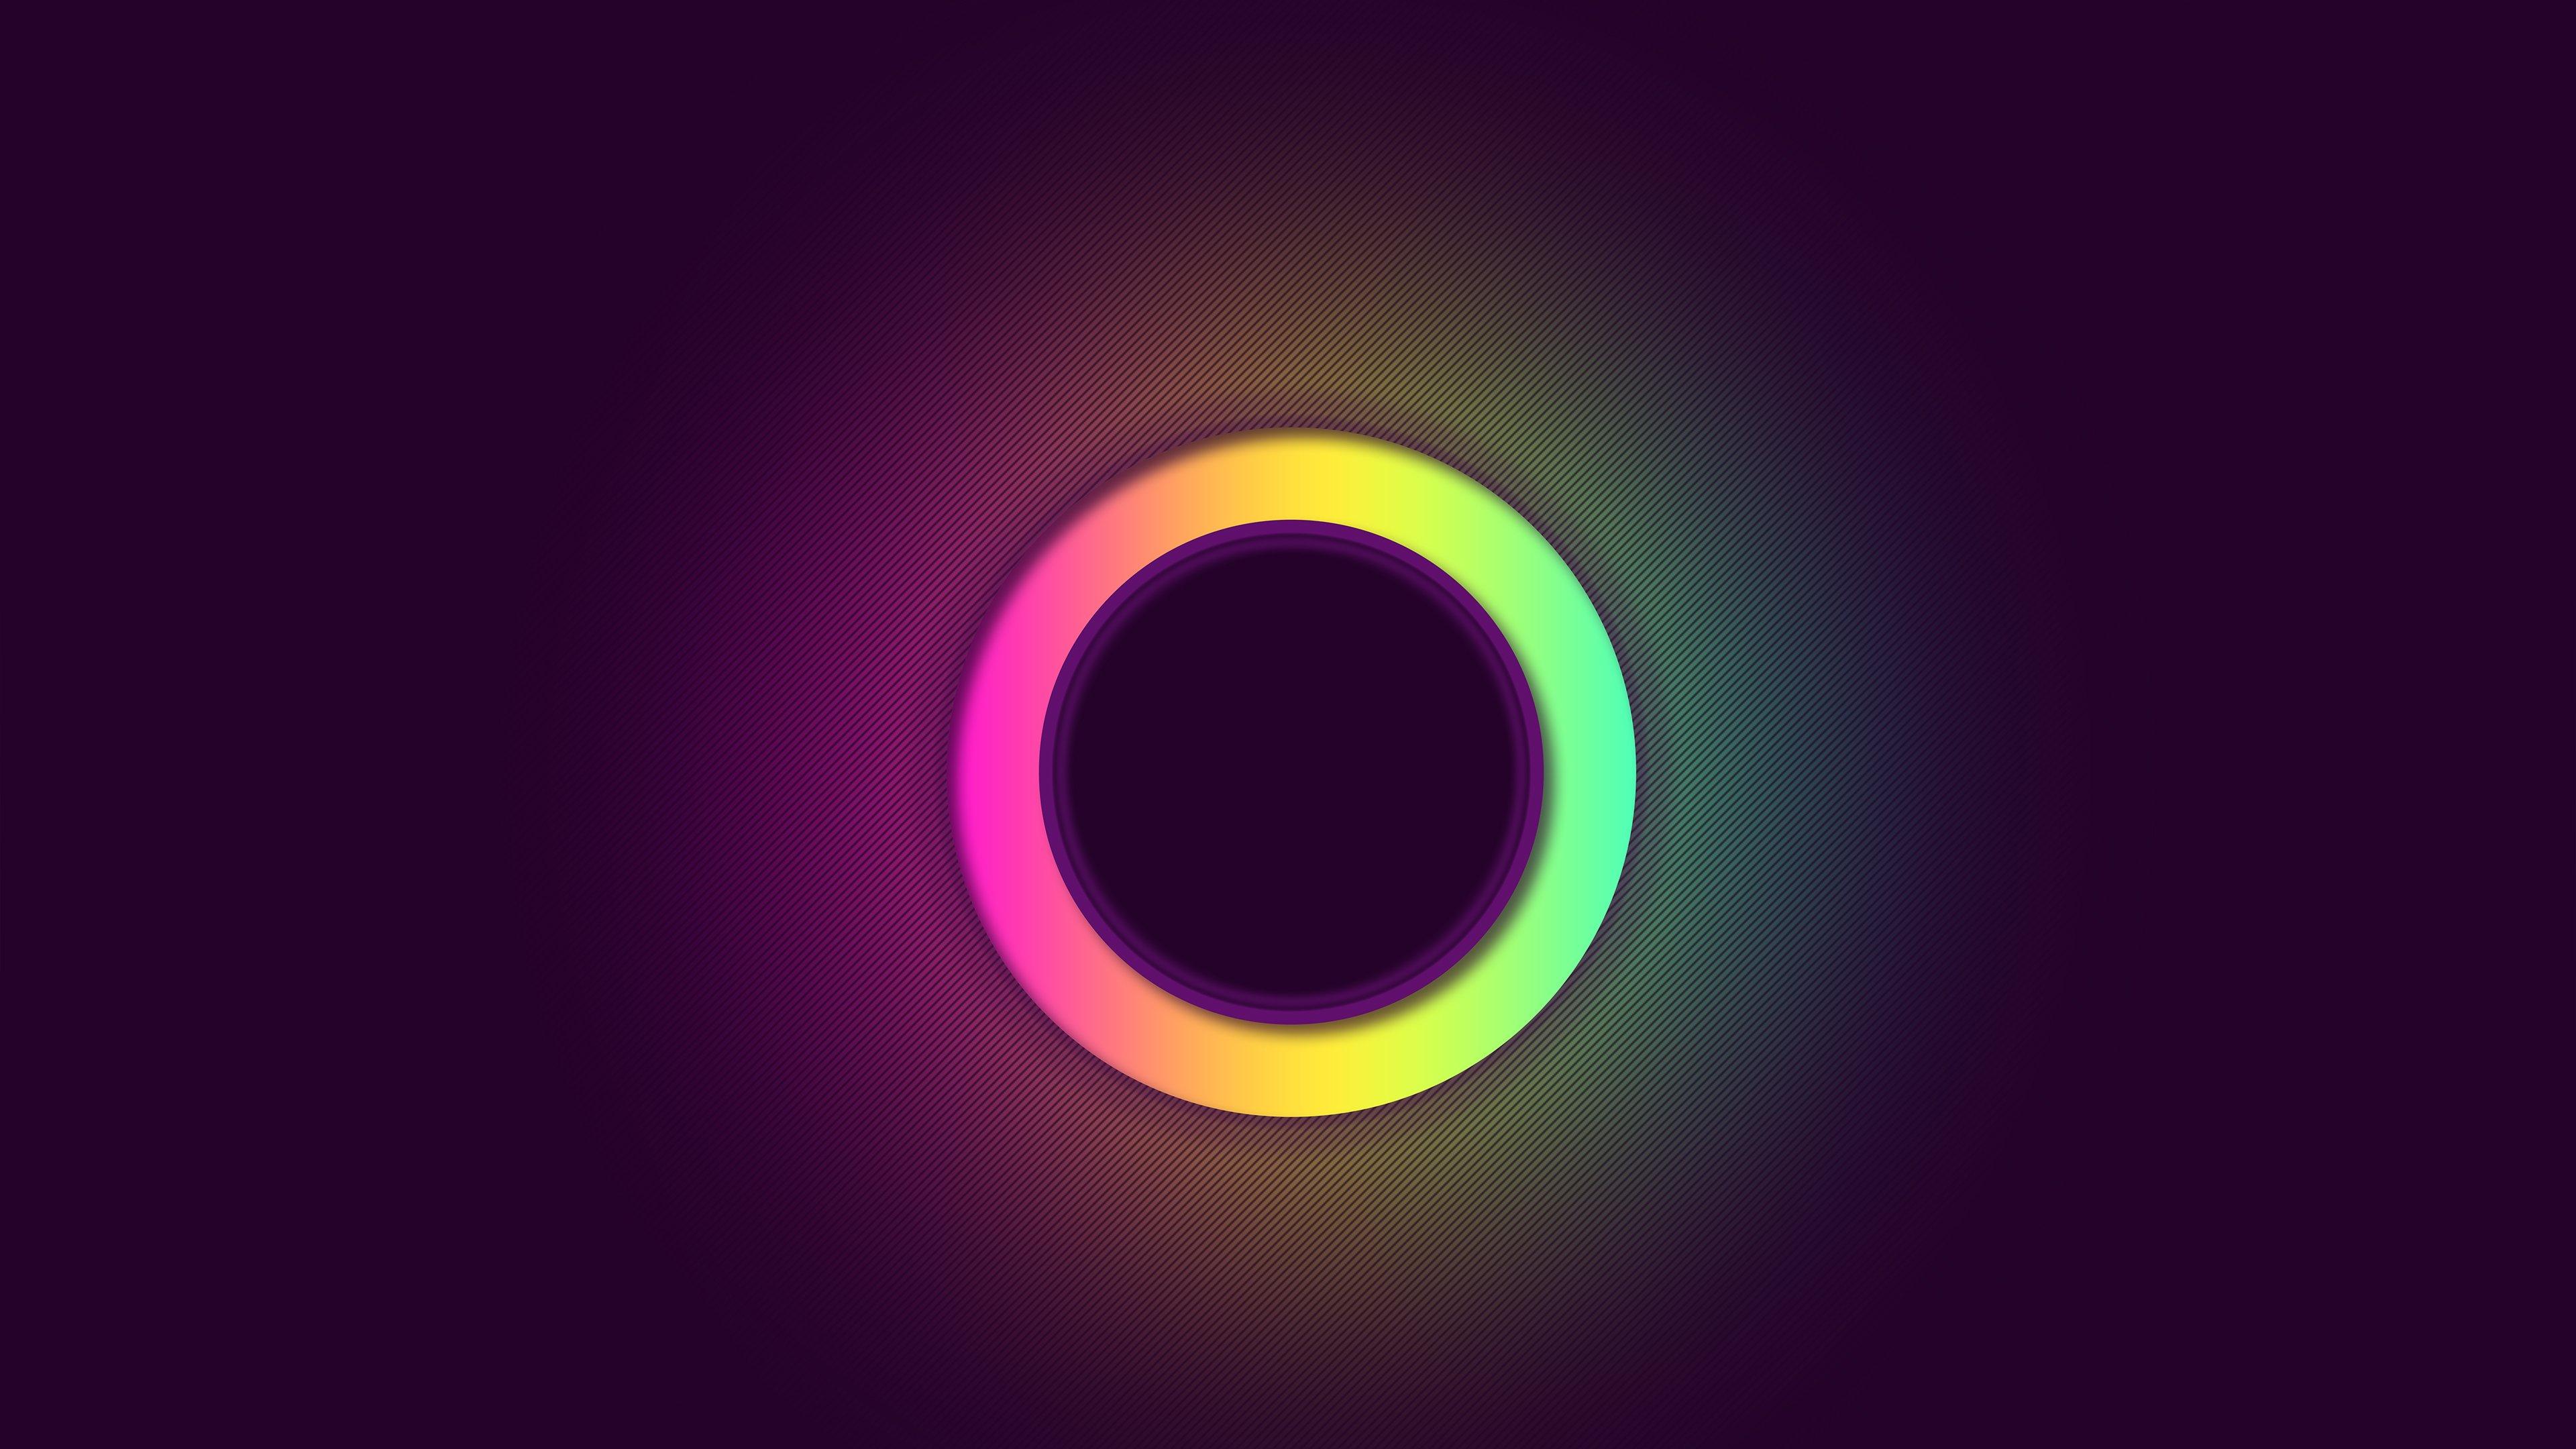 Wallpaper Ring of colors